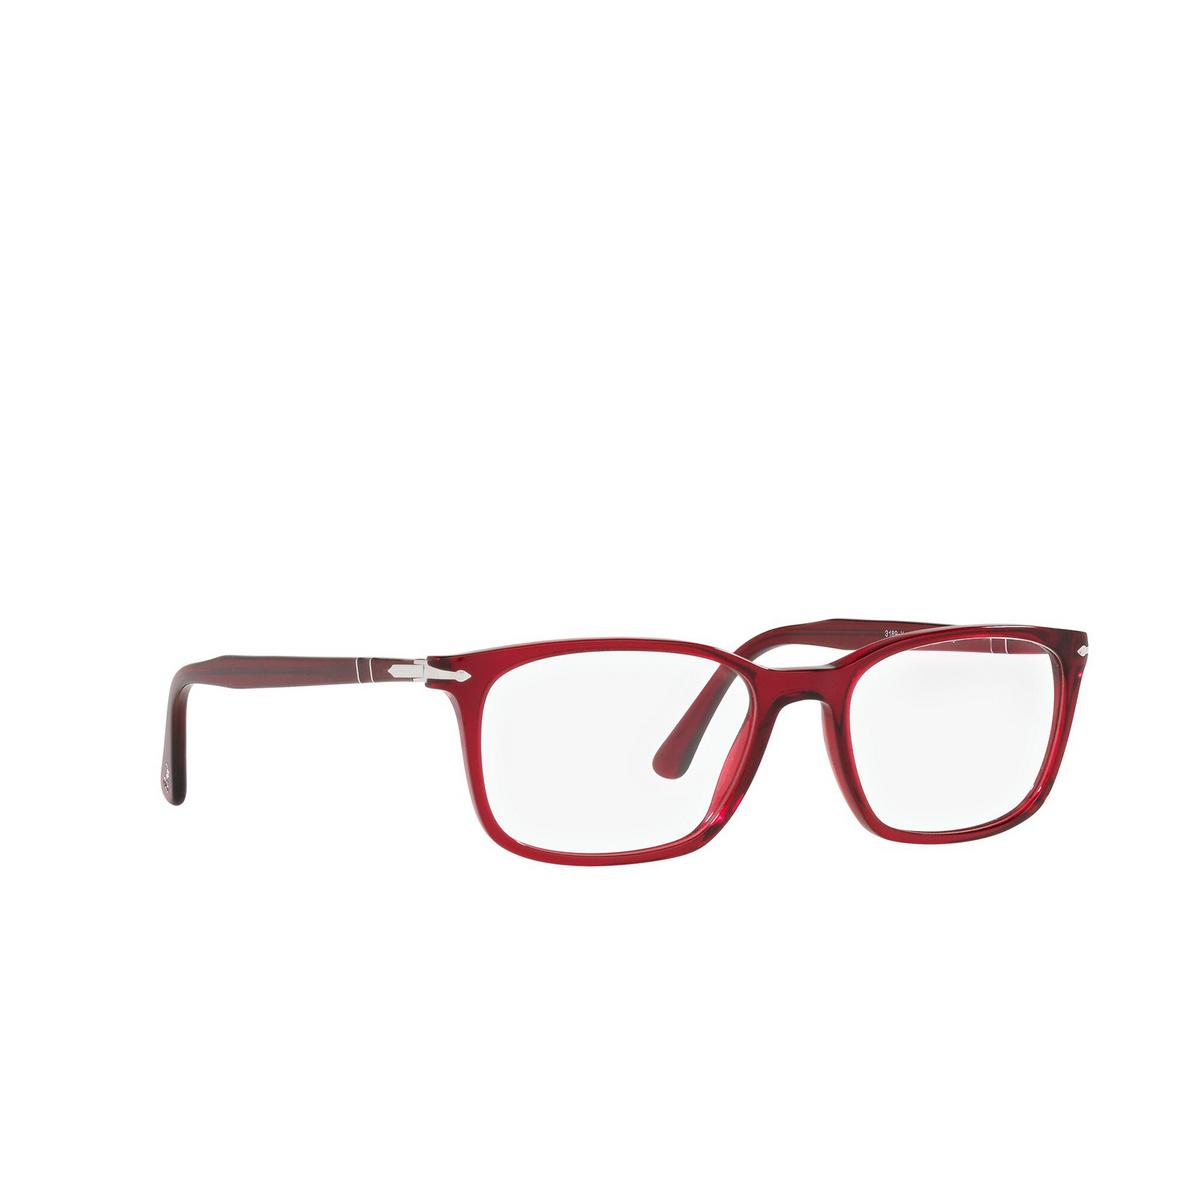 Persol® Rectangle Eyeglasses: PO3189V color Transparent Red 126 - three-quarters view.